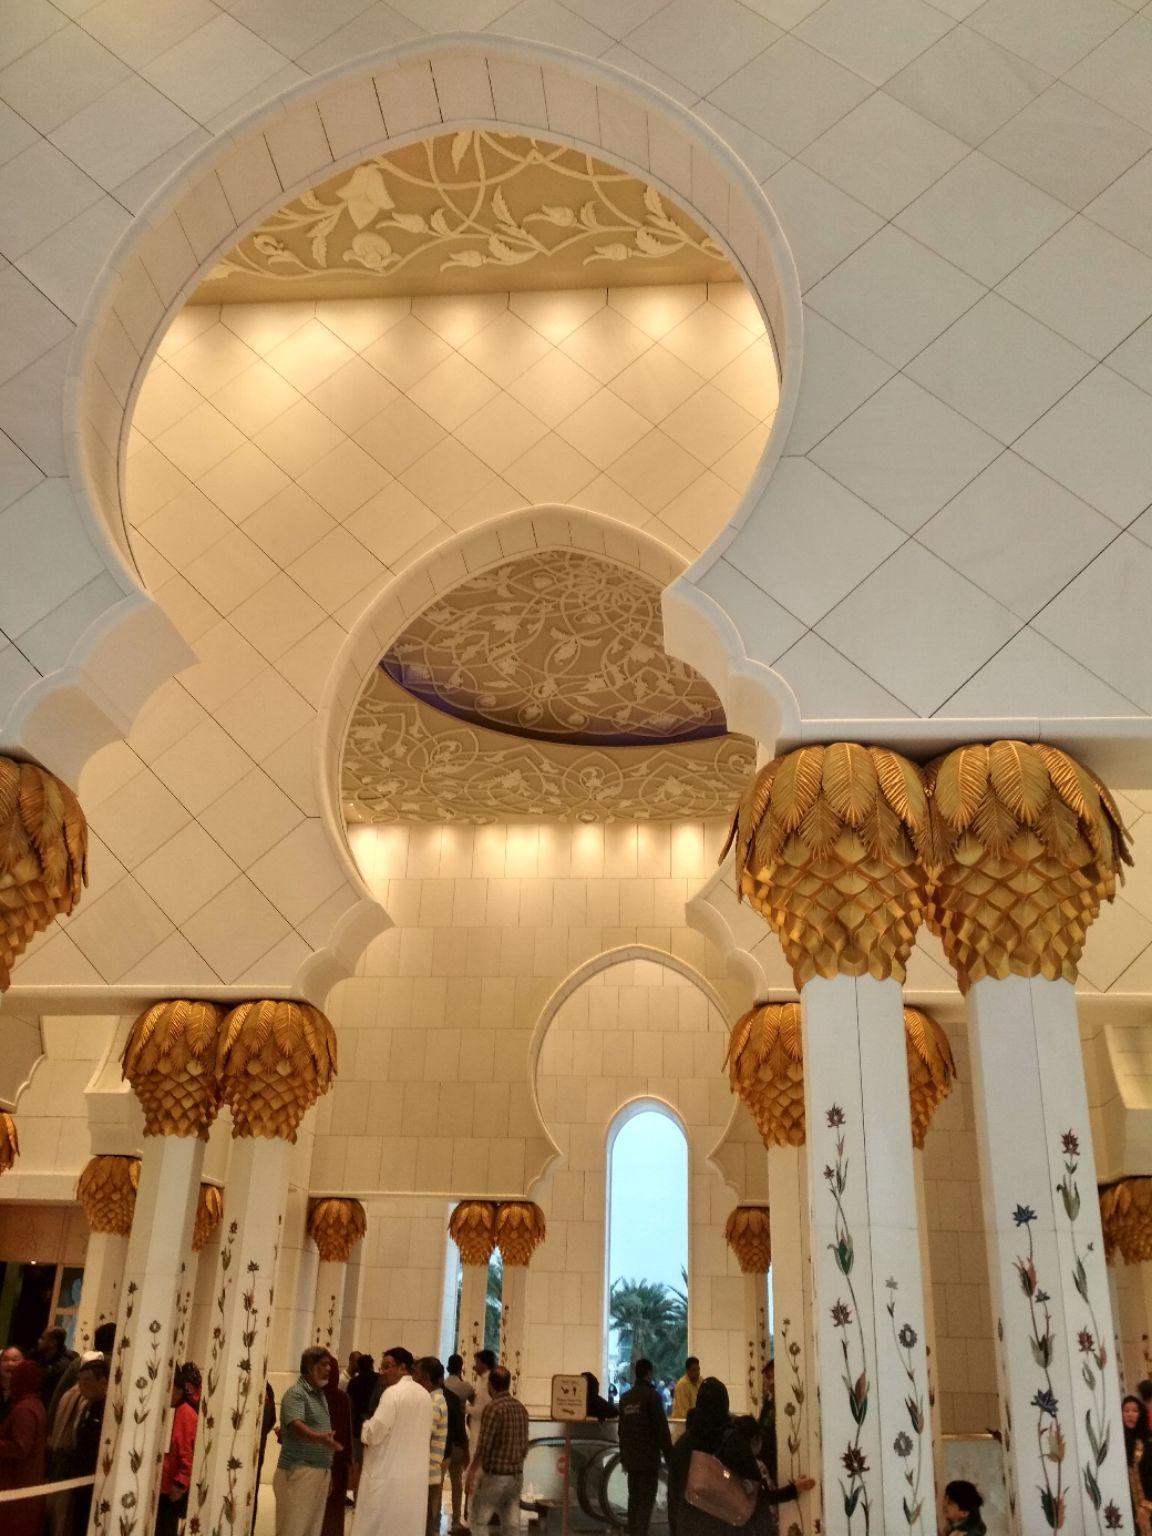 Photo of Sheikh Zayed Grand Mosque Center - Sheikh Rashid Bin Saeed St - Abu Dhabi - United Arab Emirates By Deljo Johnson